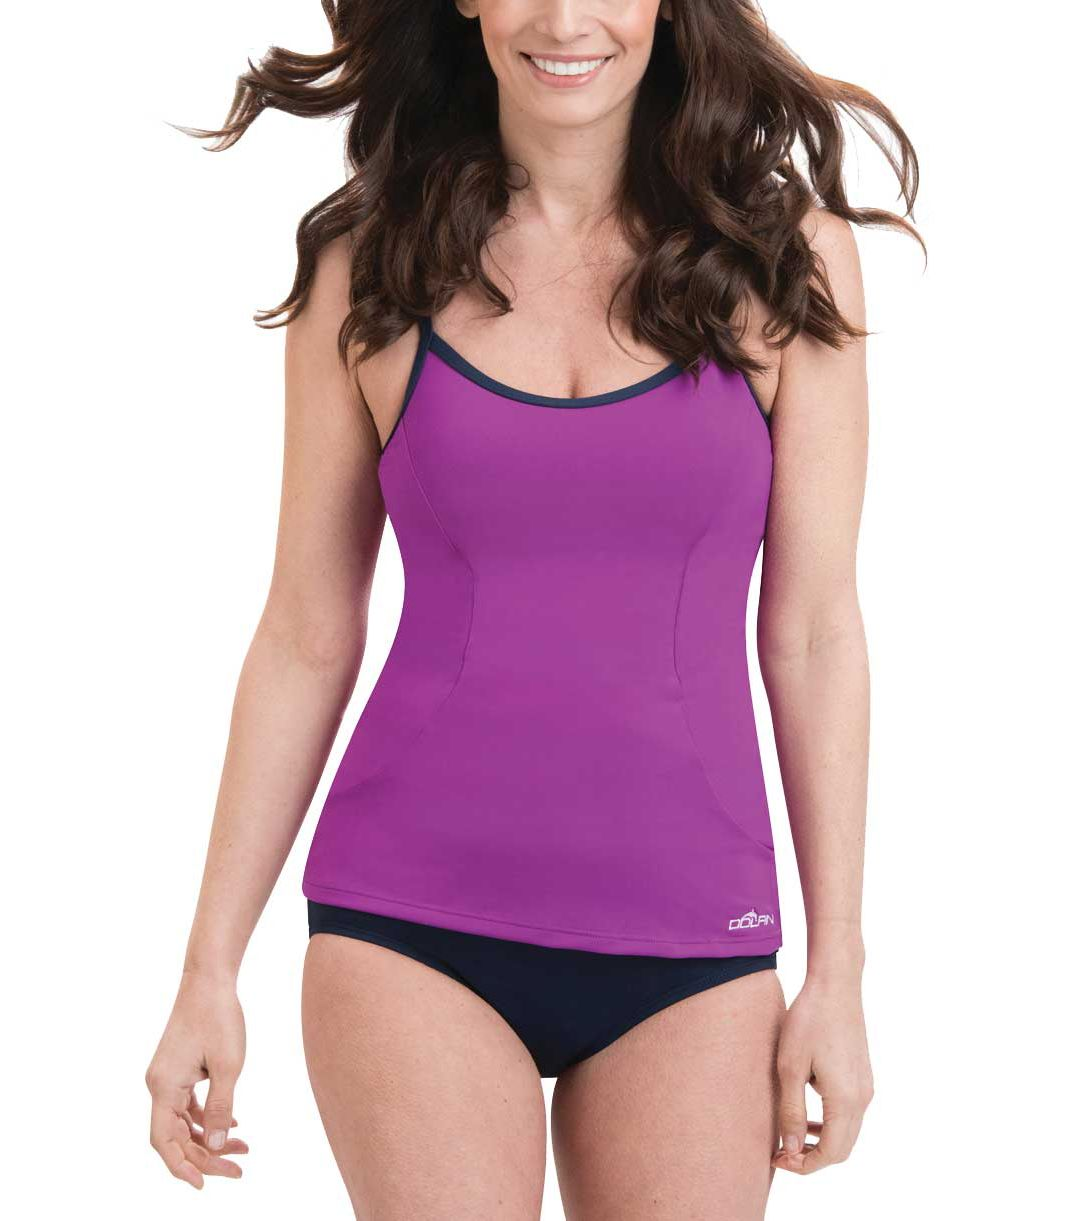 45ecfd970f2a5 Dolfin Women's Aquashape Scoop Neck Tankini Top | DICK'S Sporting Goods